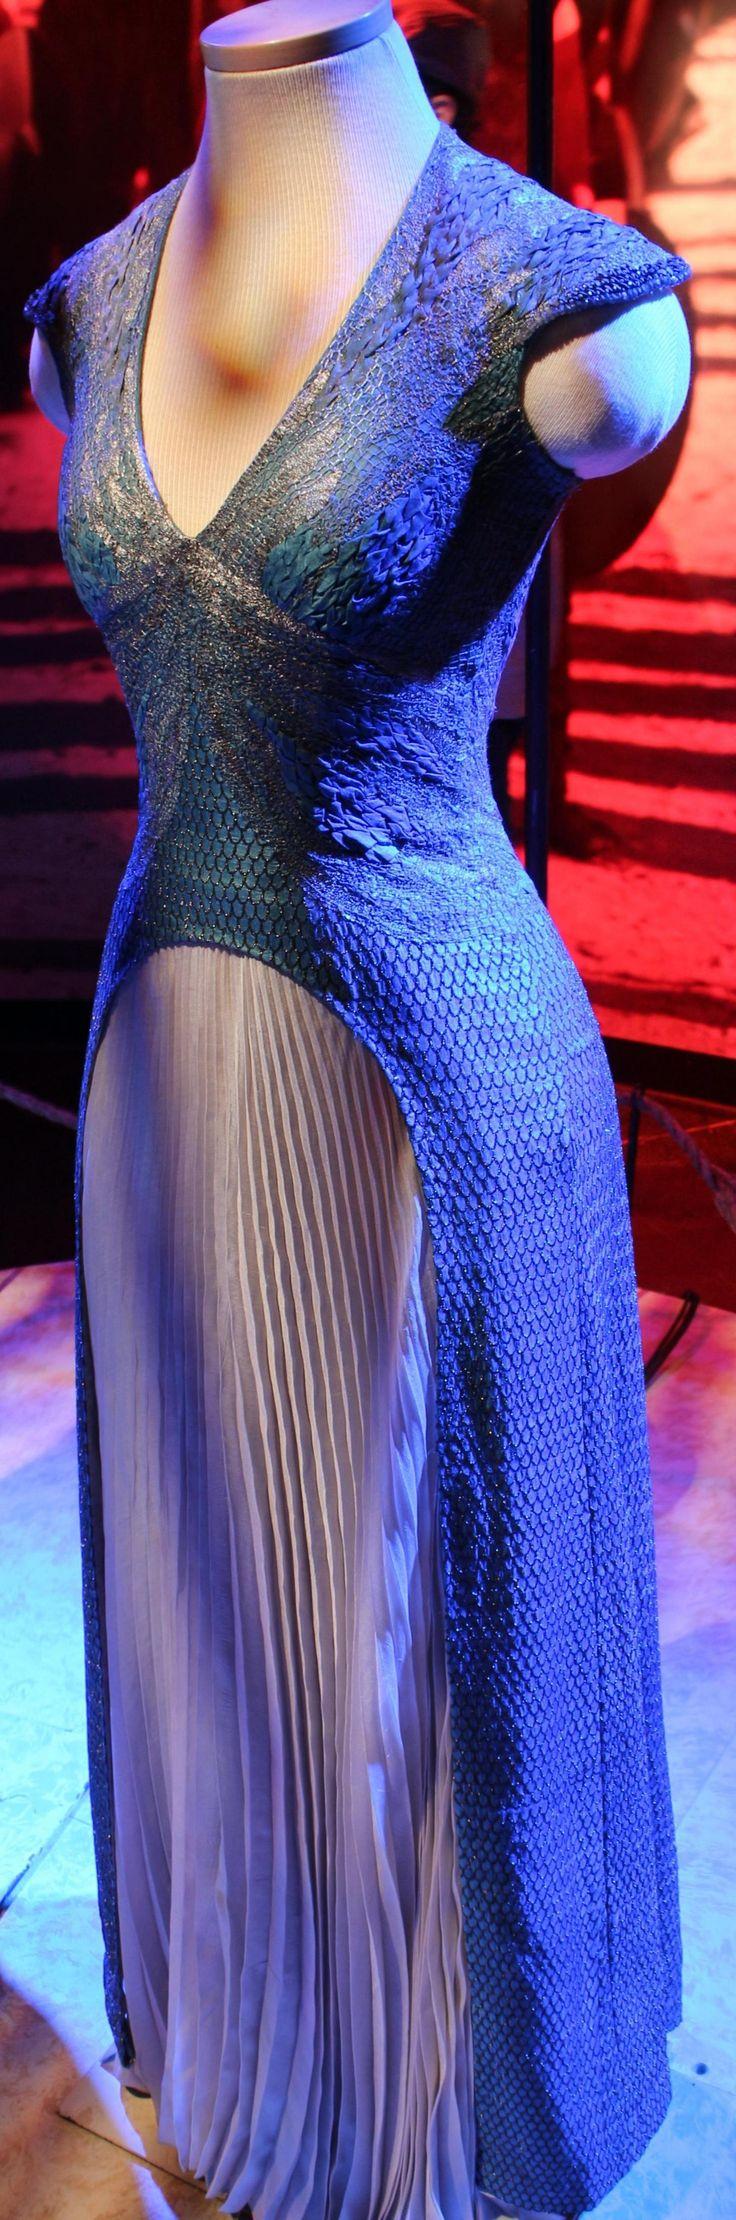 Daenerys - Costume Journey - Album on Imgur